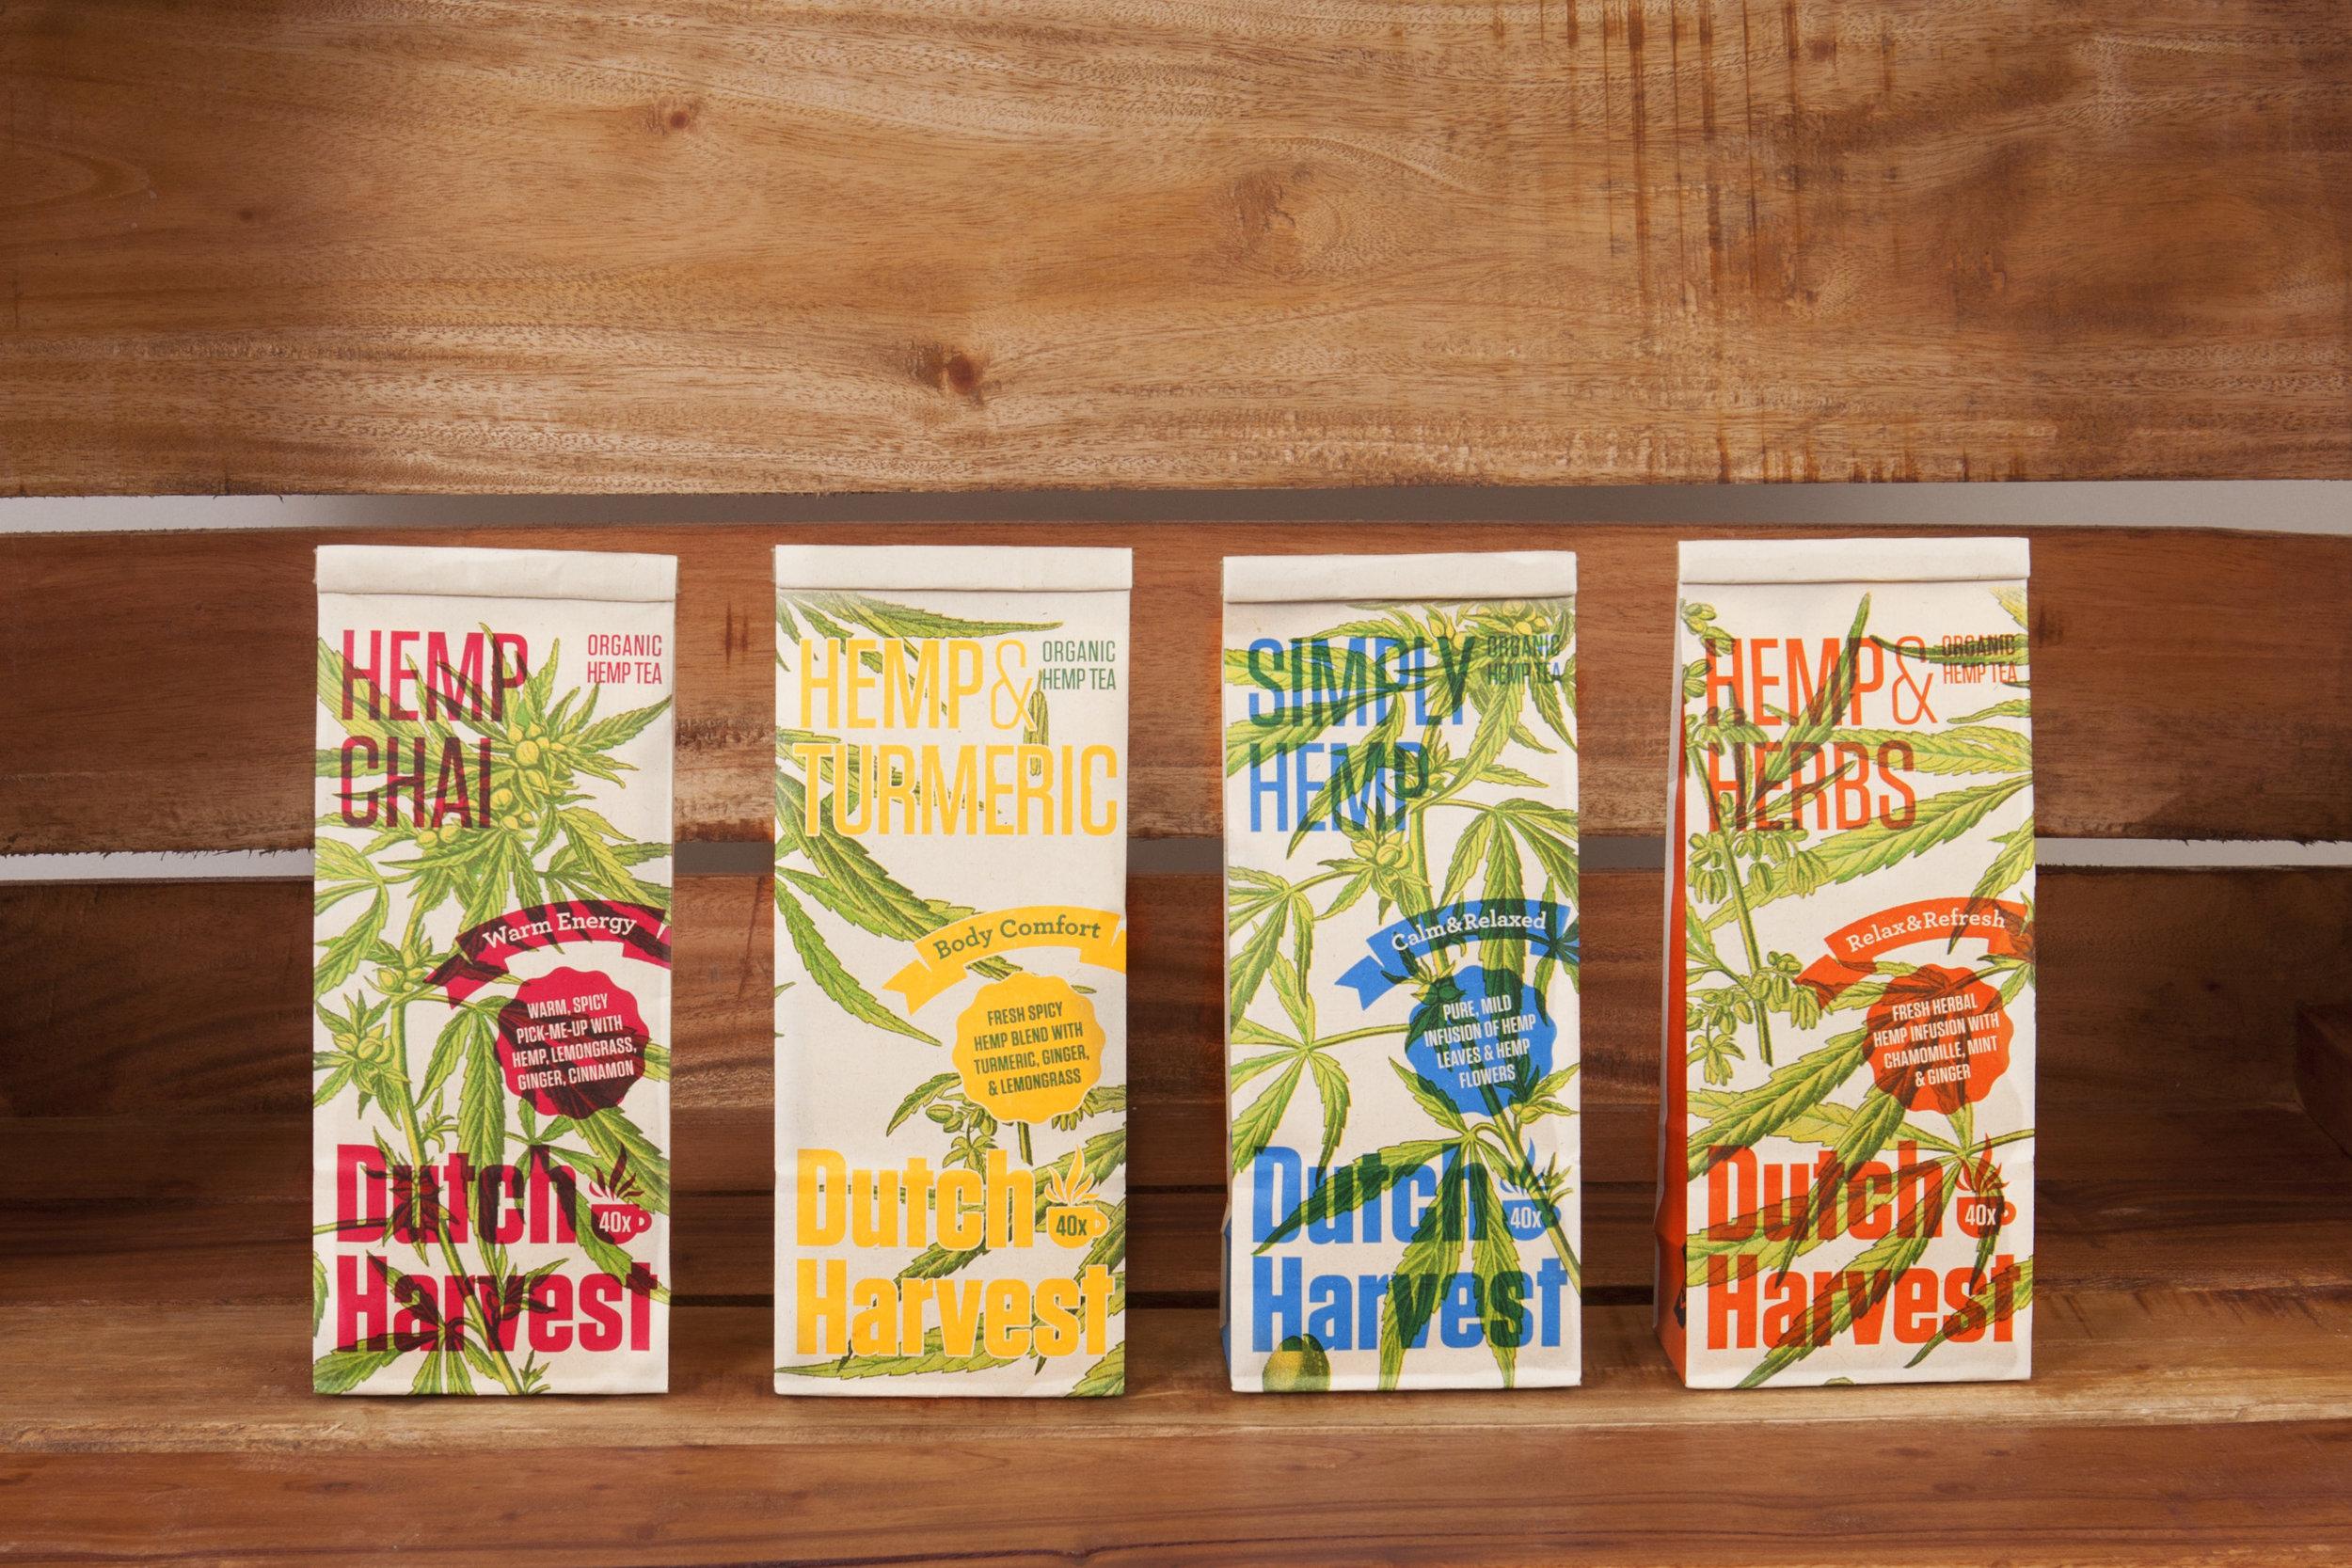 Dutch-Harvest-Hemp-Tea-Allpacks-Front.jpeg